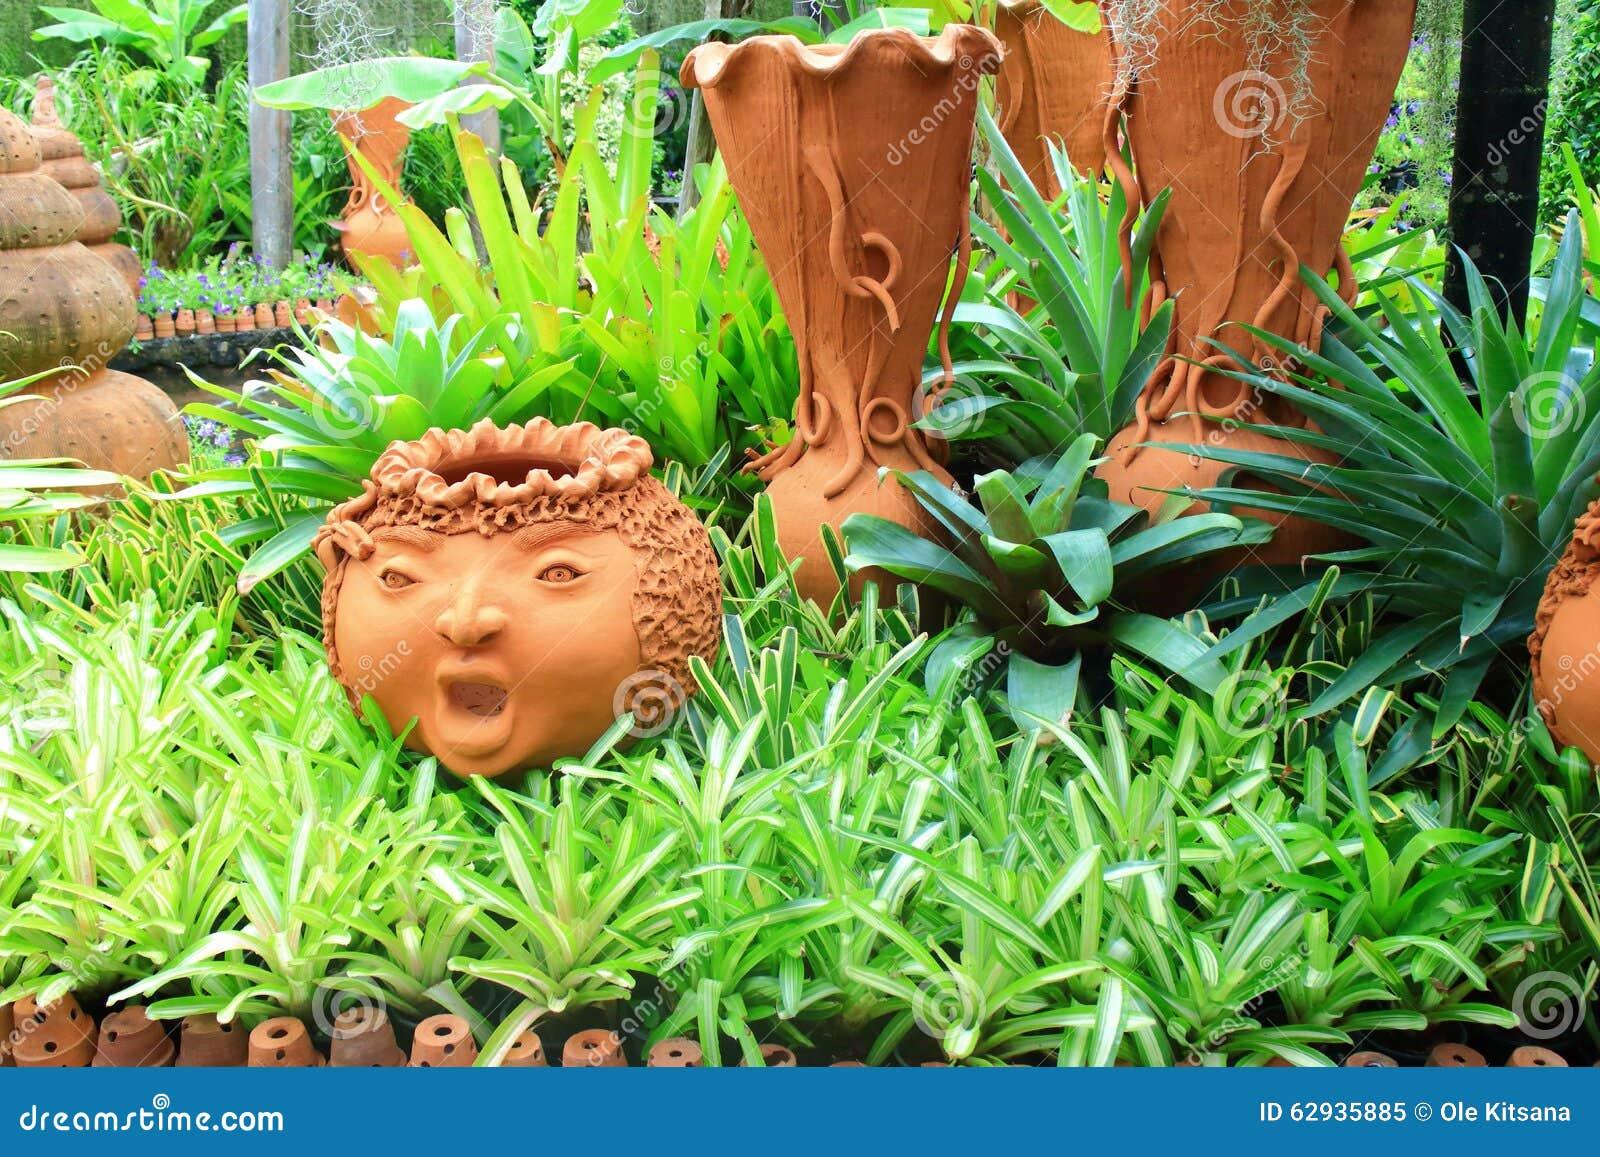 grande poterie de jardin poterie terre cuite fonce poterie terre cuite fonc poterie de jardin. Black Bedroom Furniture Sets. Home Design Ideas